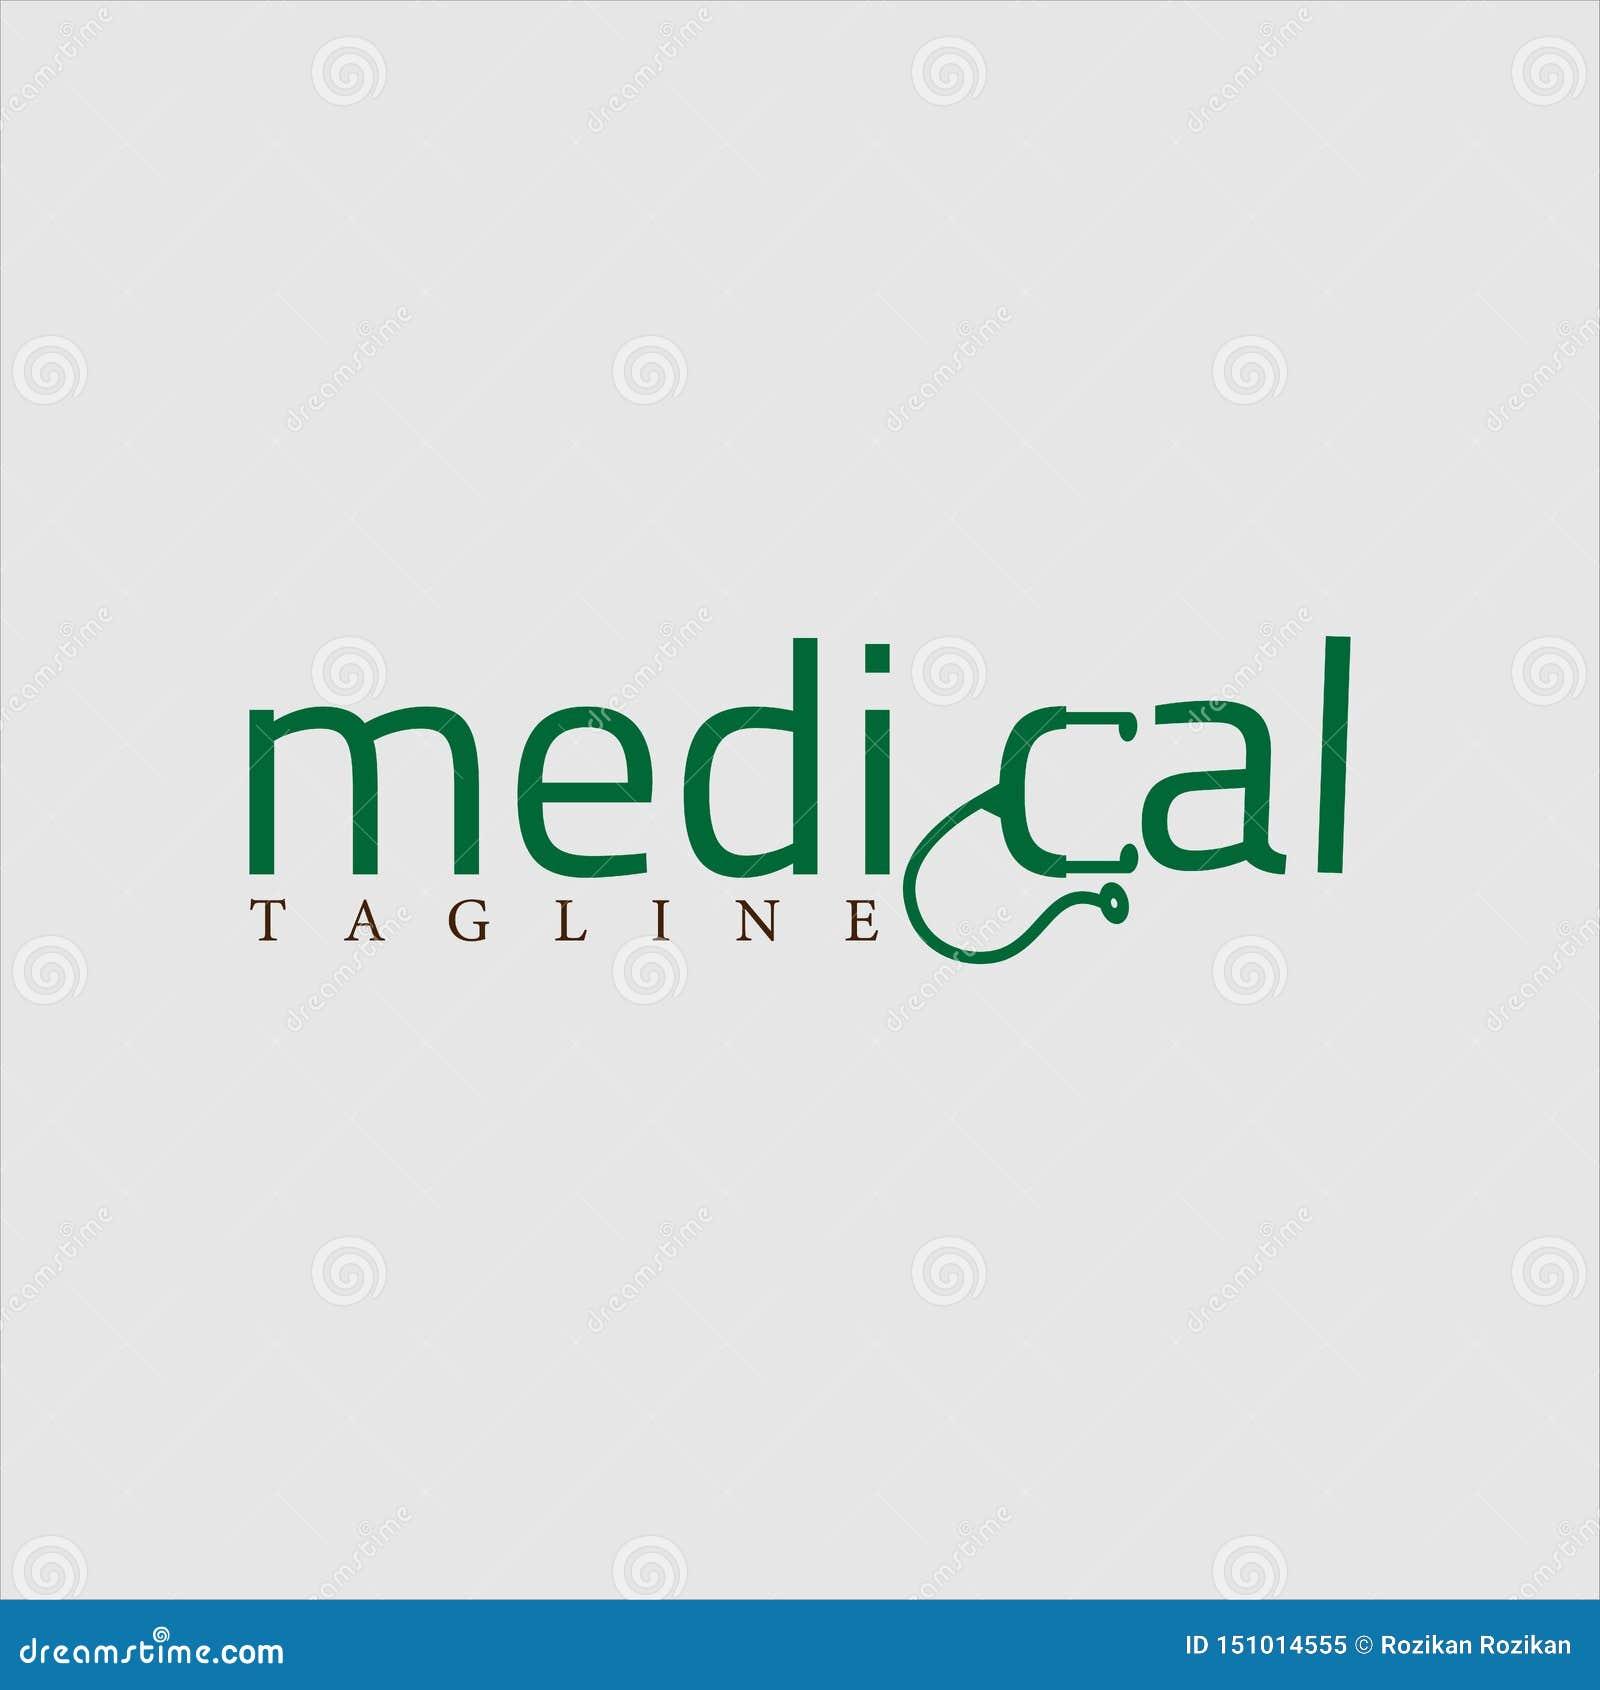 Vetor médico do verde do projeto do logotipo conceptual